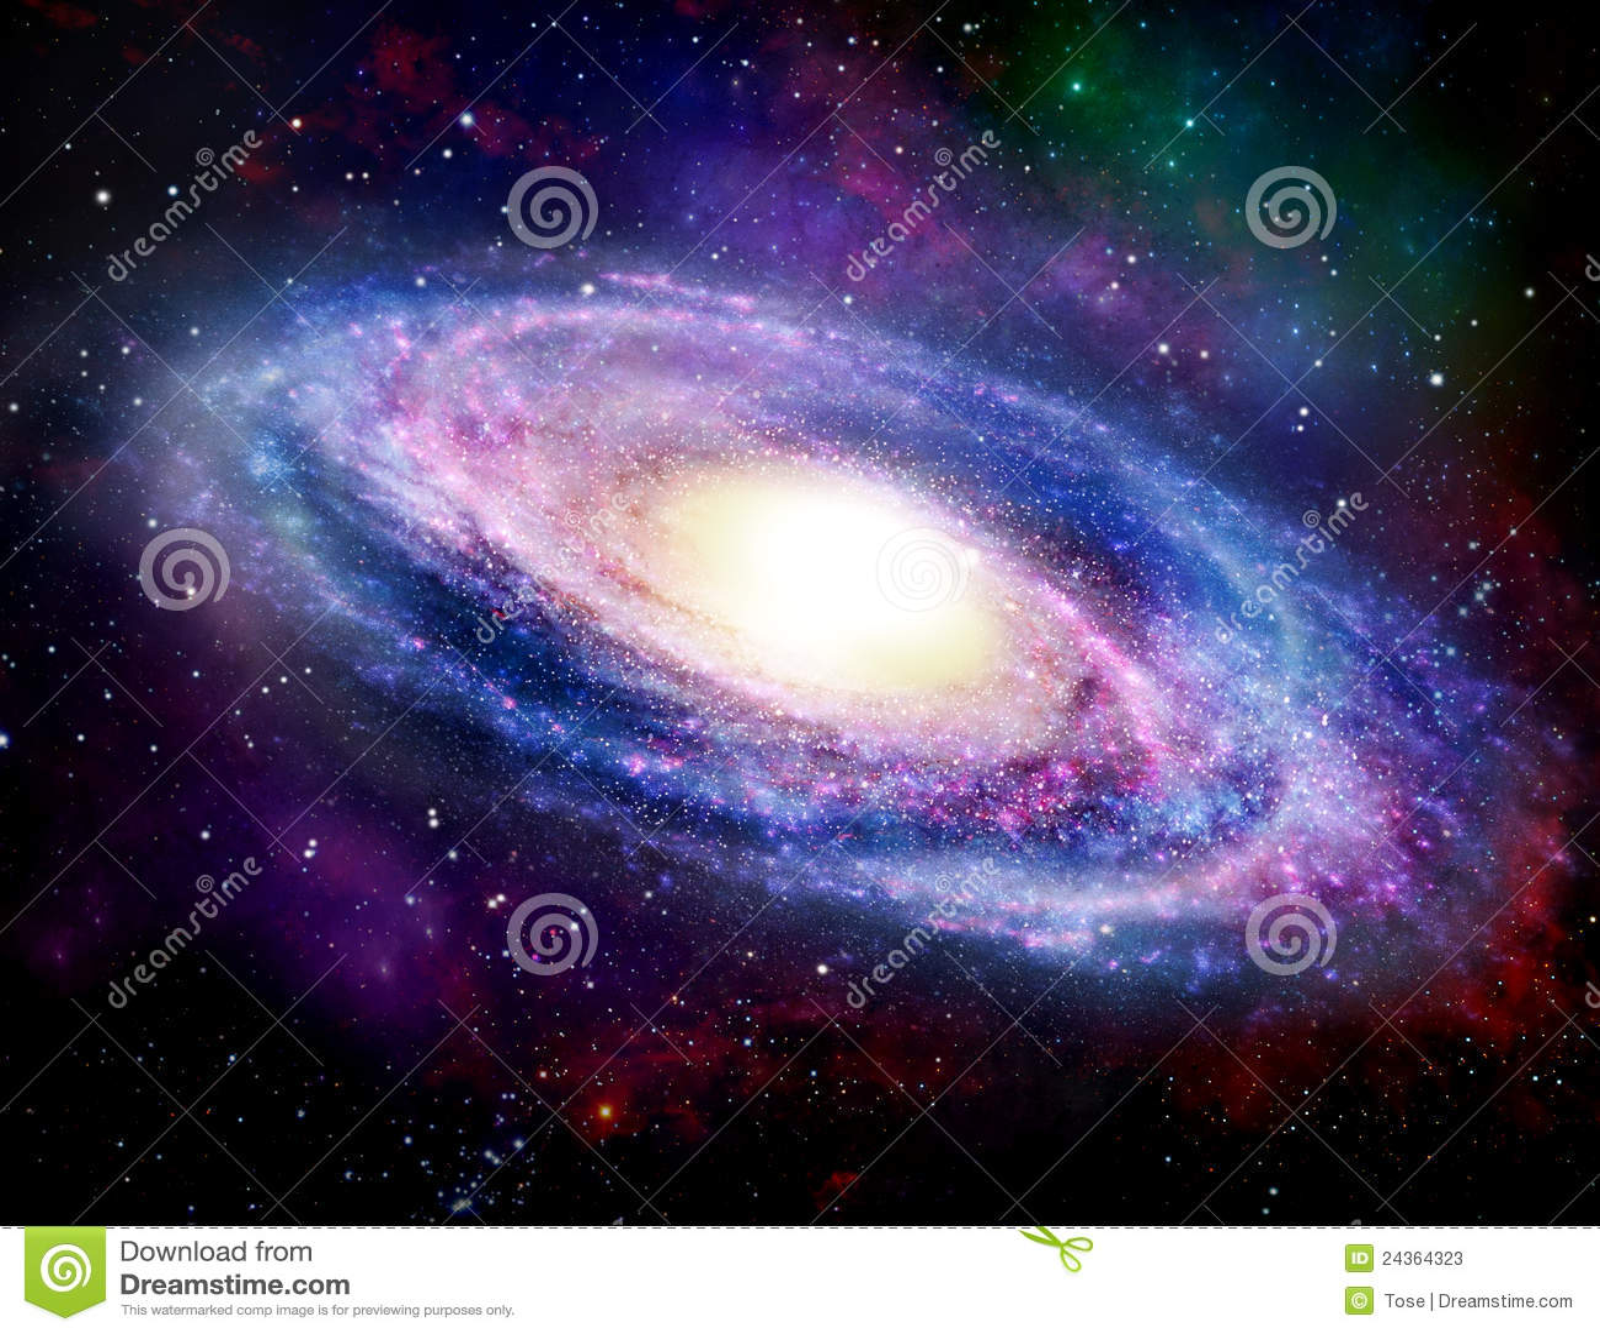 Spiral Galaxy stock illustration. Image of galactic, star